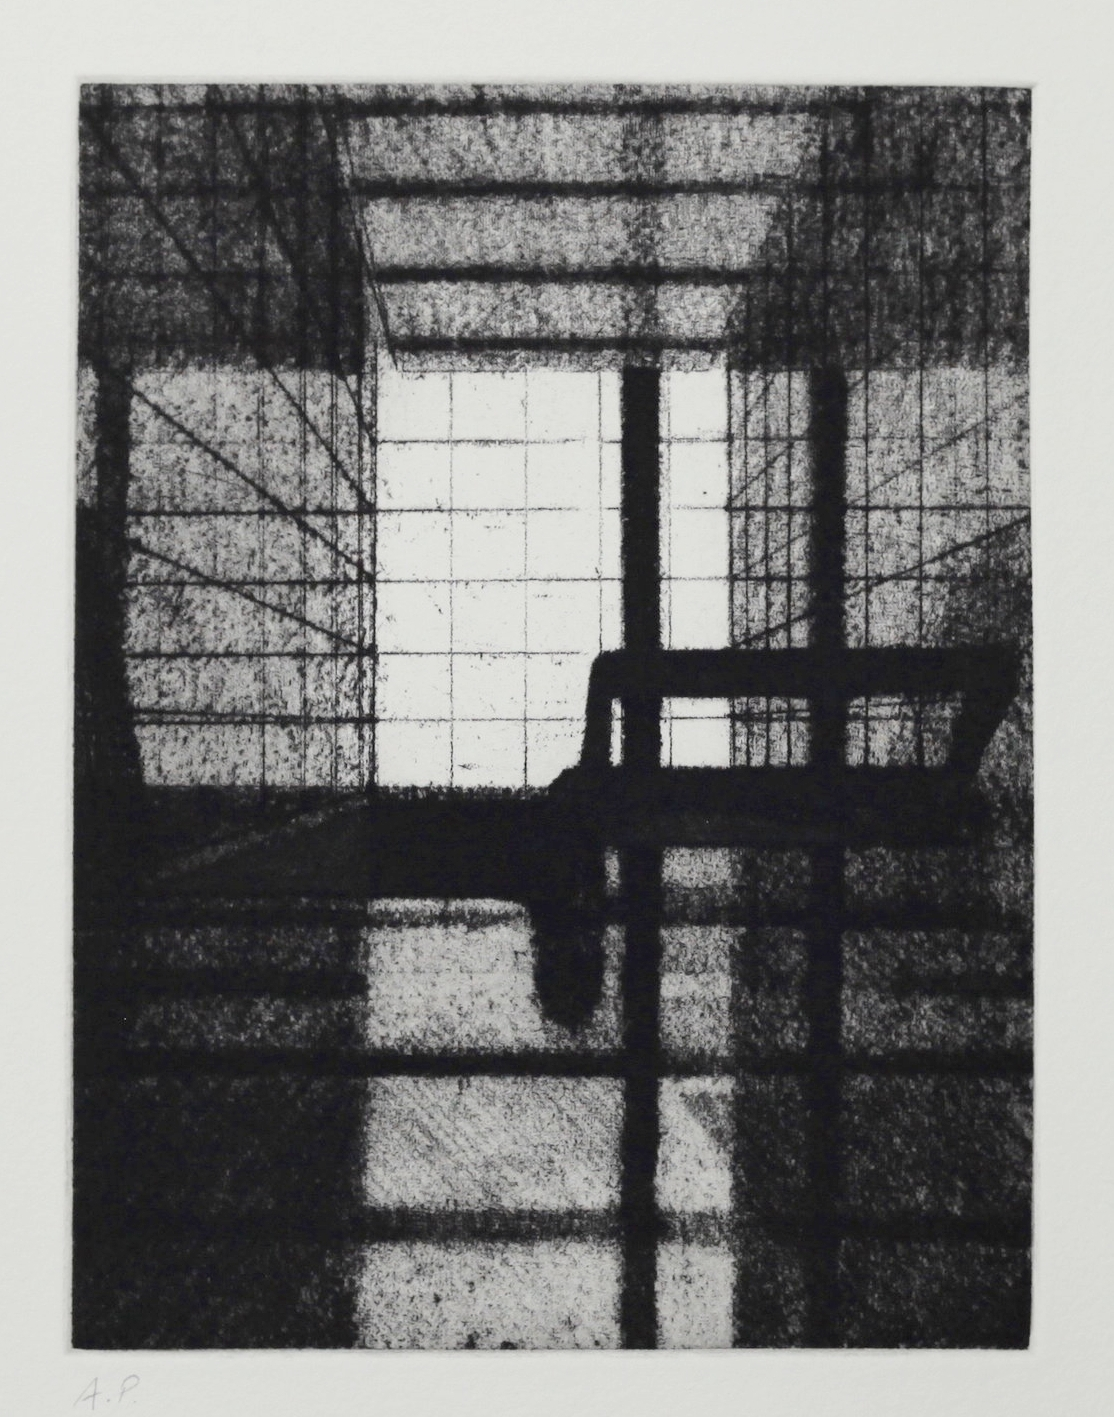 Interior (Foyer I), Soft ground etching, Zinc plate 195x146mm, 2017